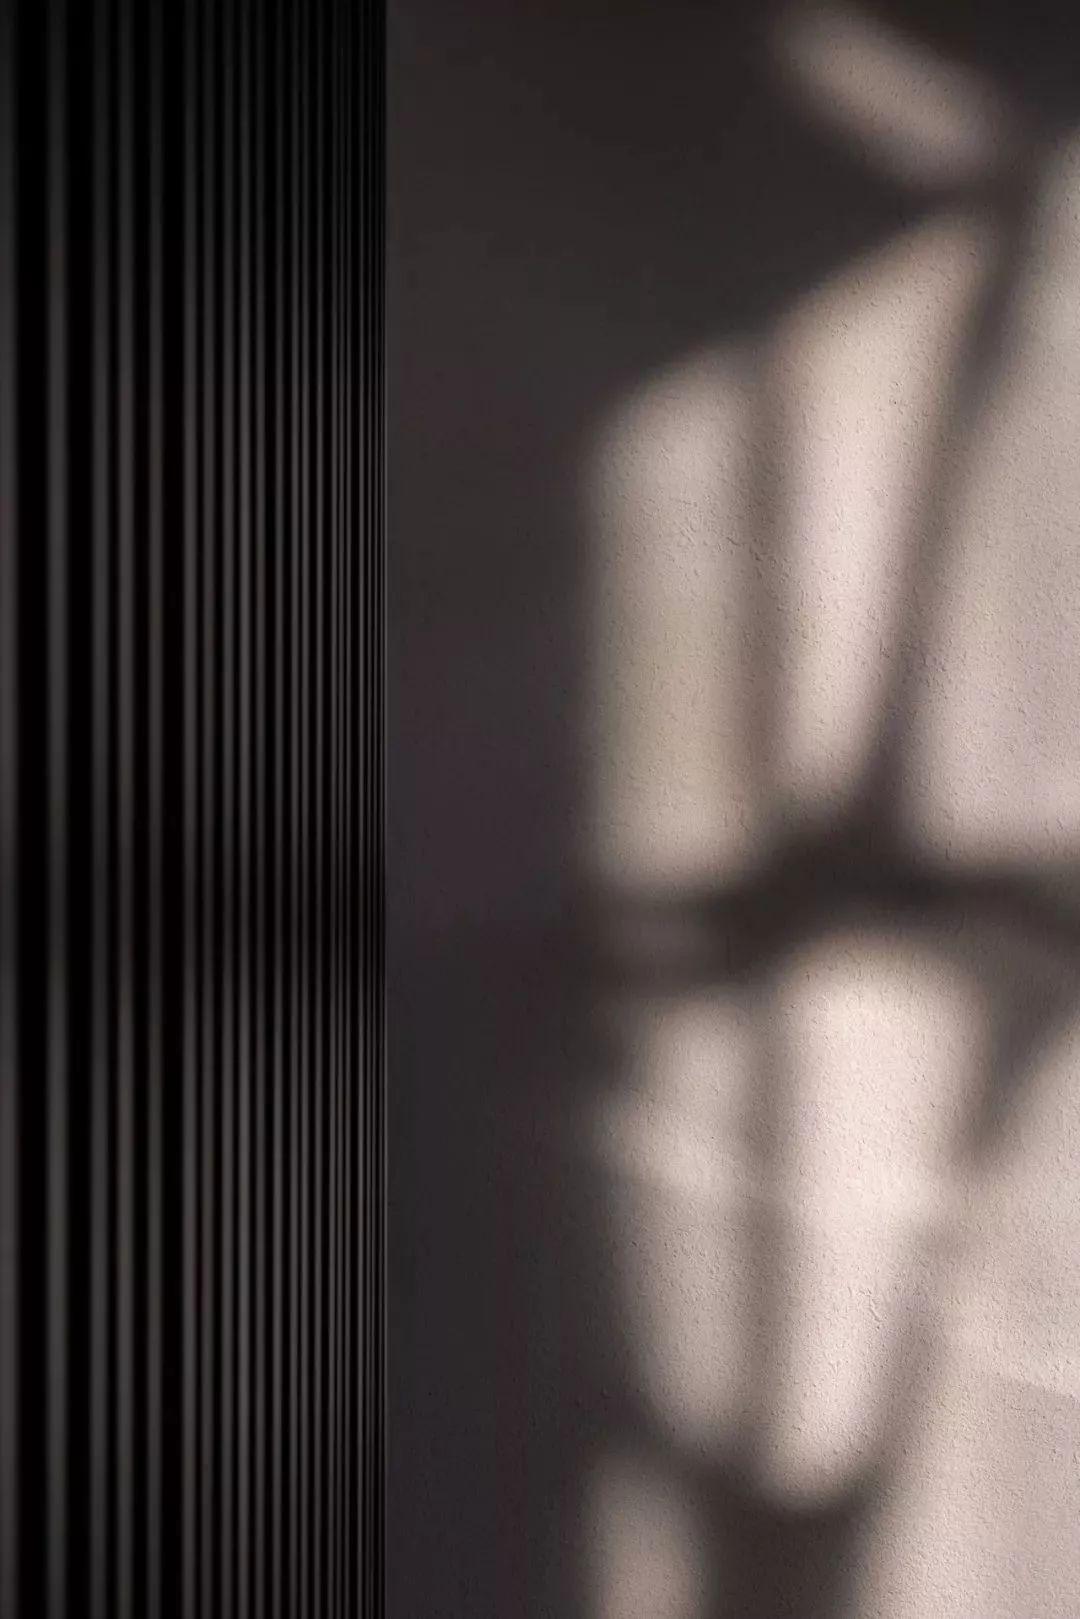 c945d6607b3b949e0e44d3348c4d0dc5.jpg